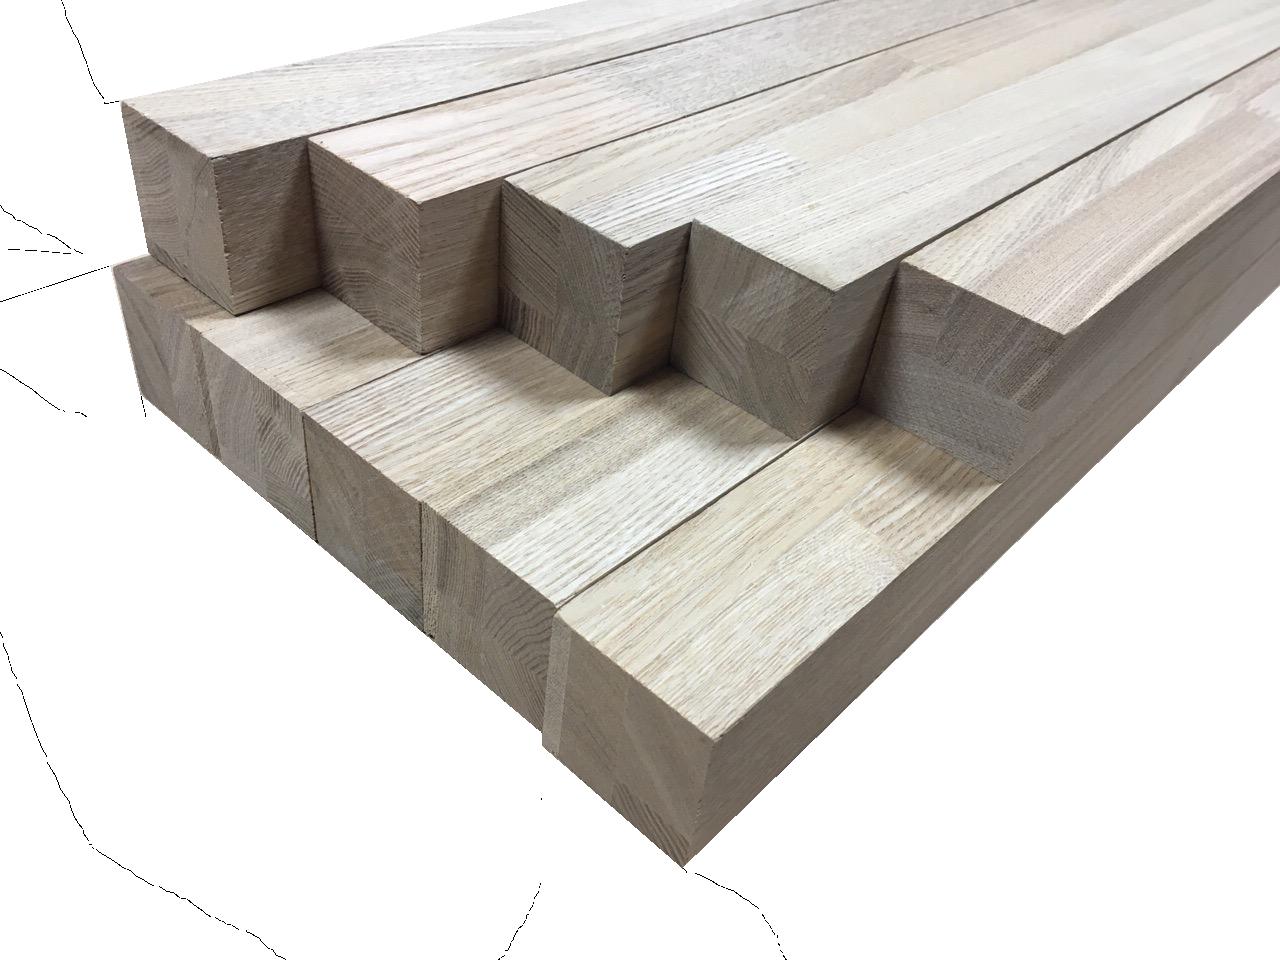 Мебельный брус - ясень сращённый 50 мм х 50 мм х 900 мм